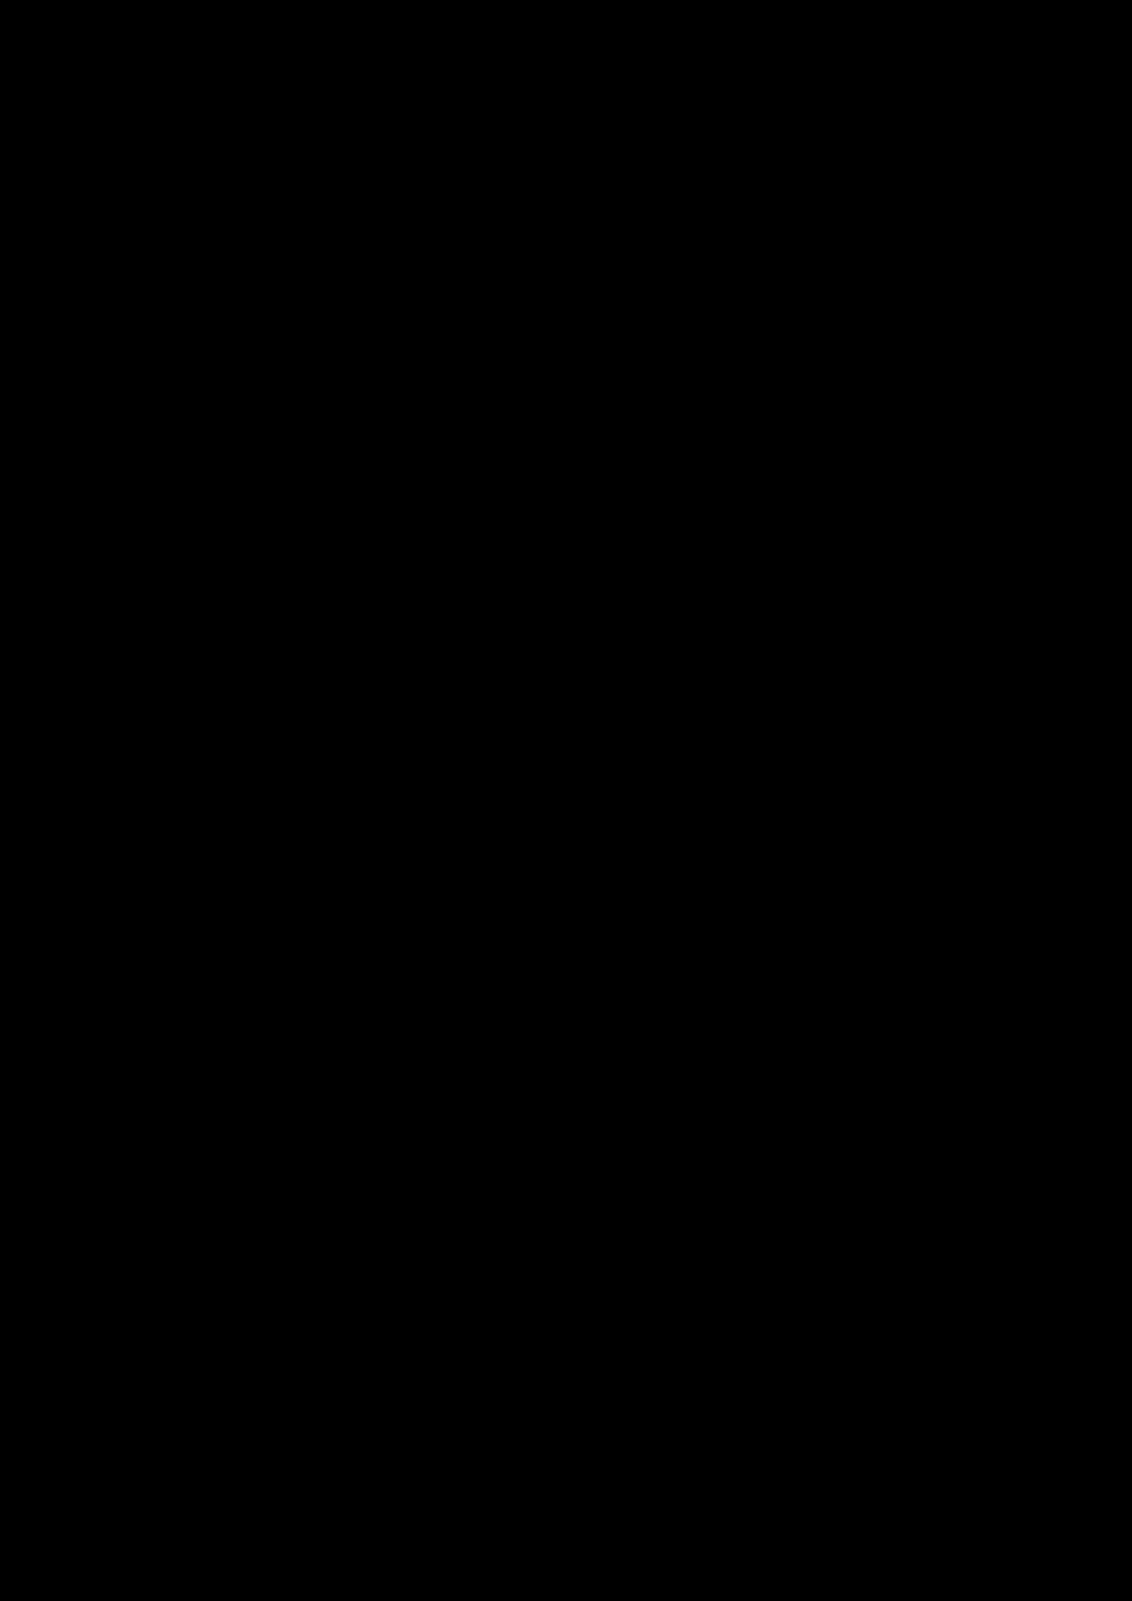 Belyiy sokol slide, Image 85